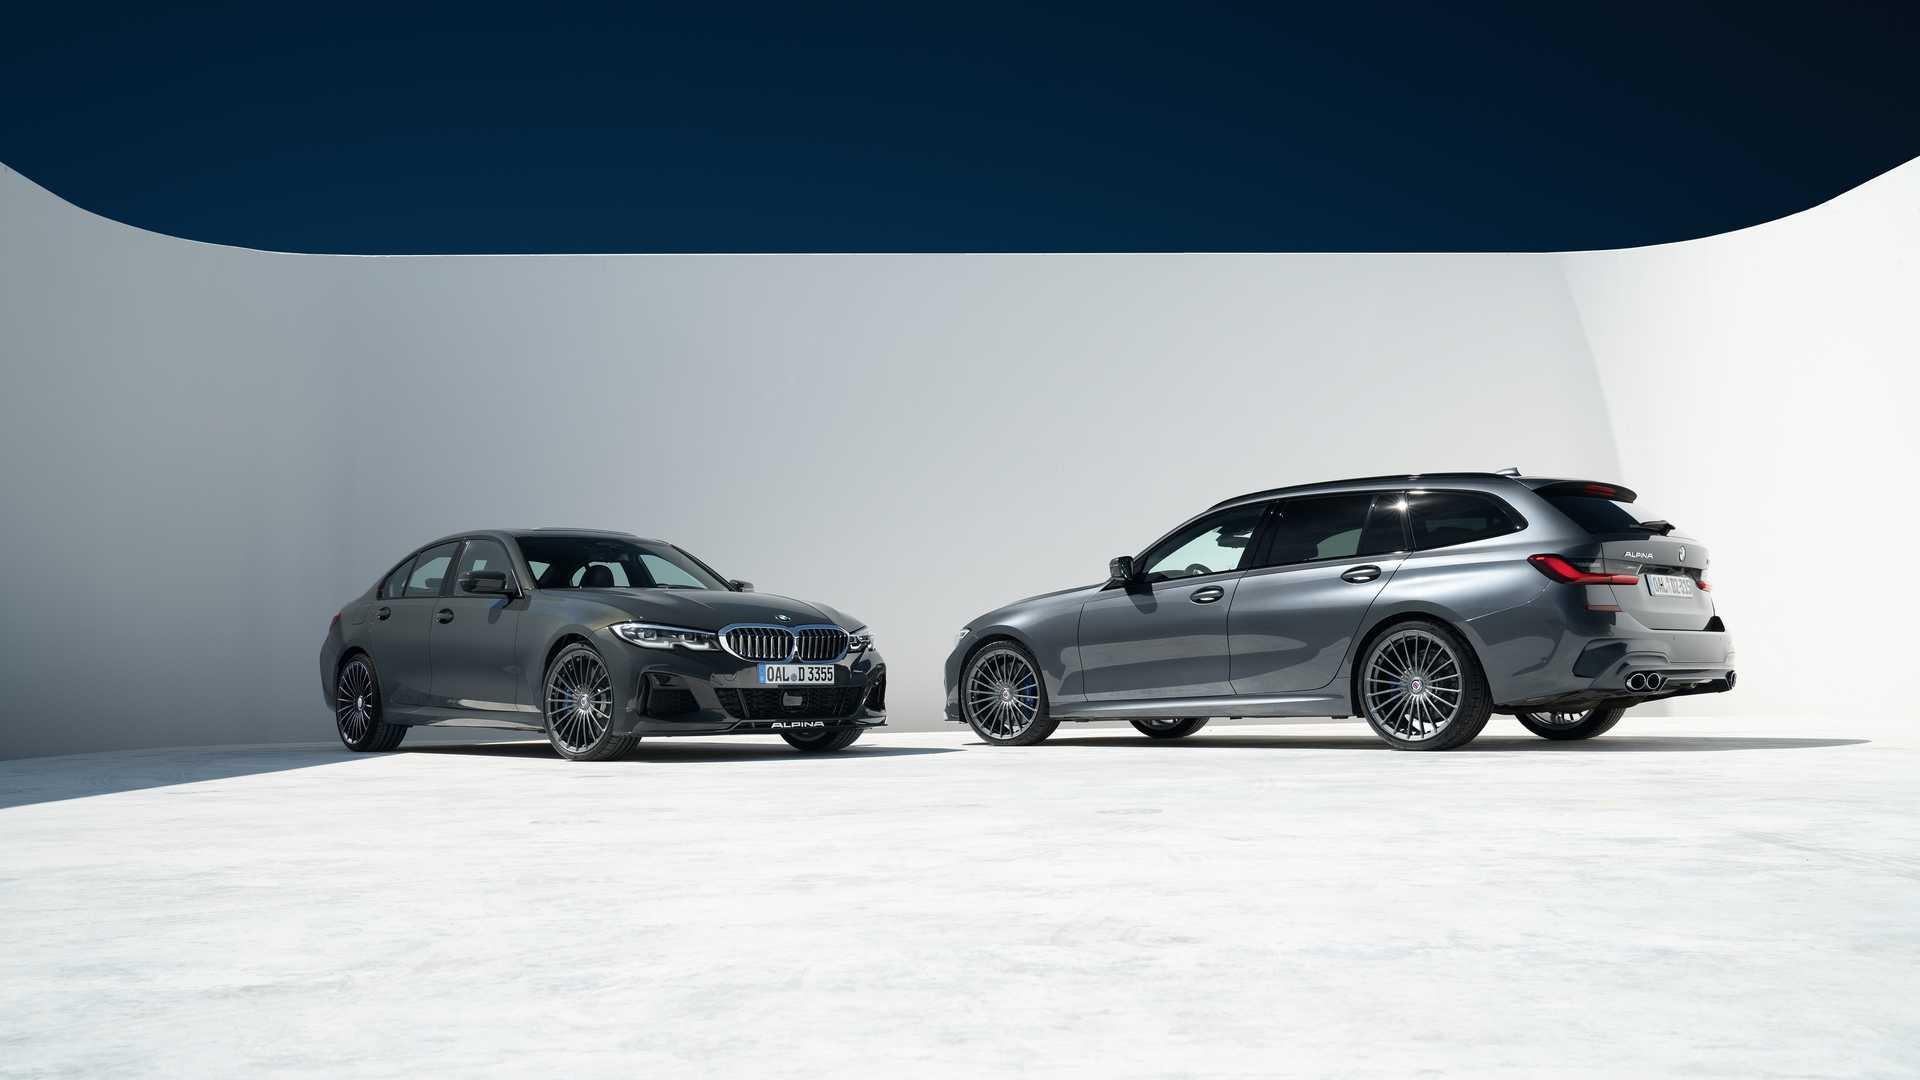 2021 BMW Alpina D3 S